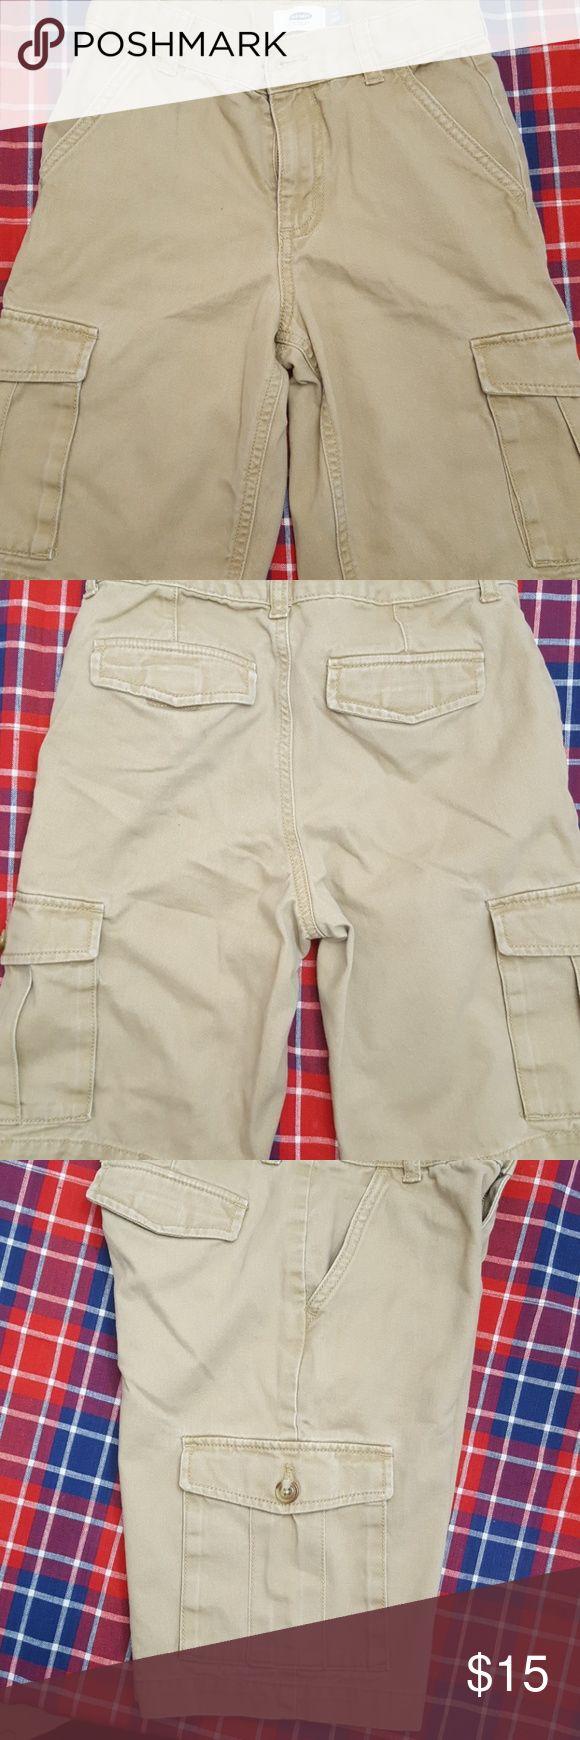 Old navy youth cargo shorts Boys cargo jean shorts. Great as school uniform bottom. Old Navy Shorts Jean Shorts